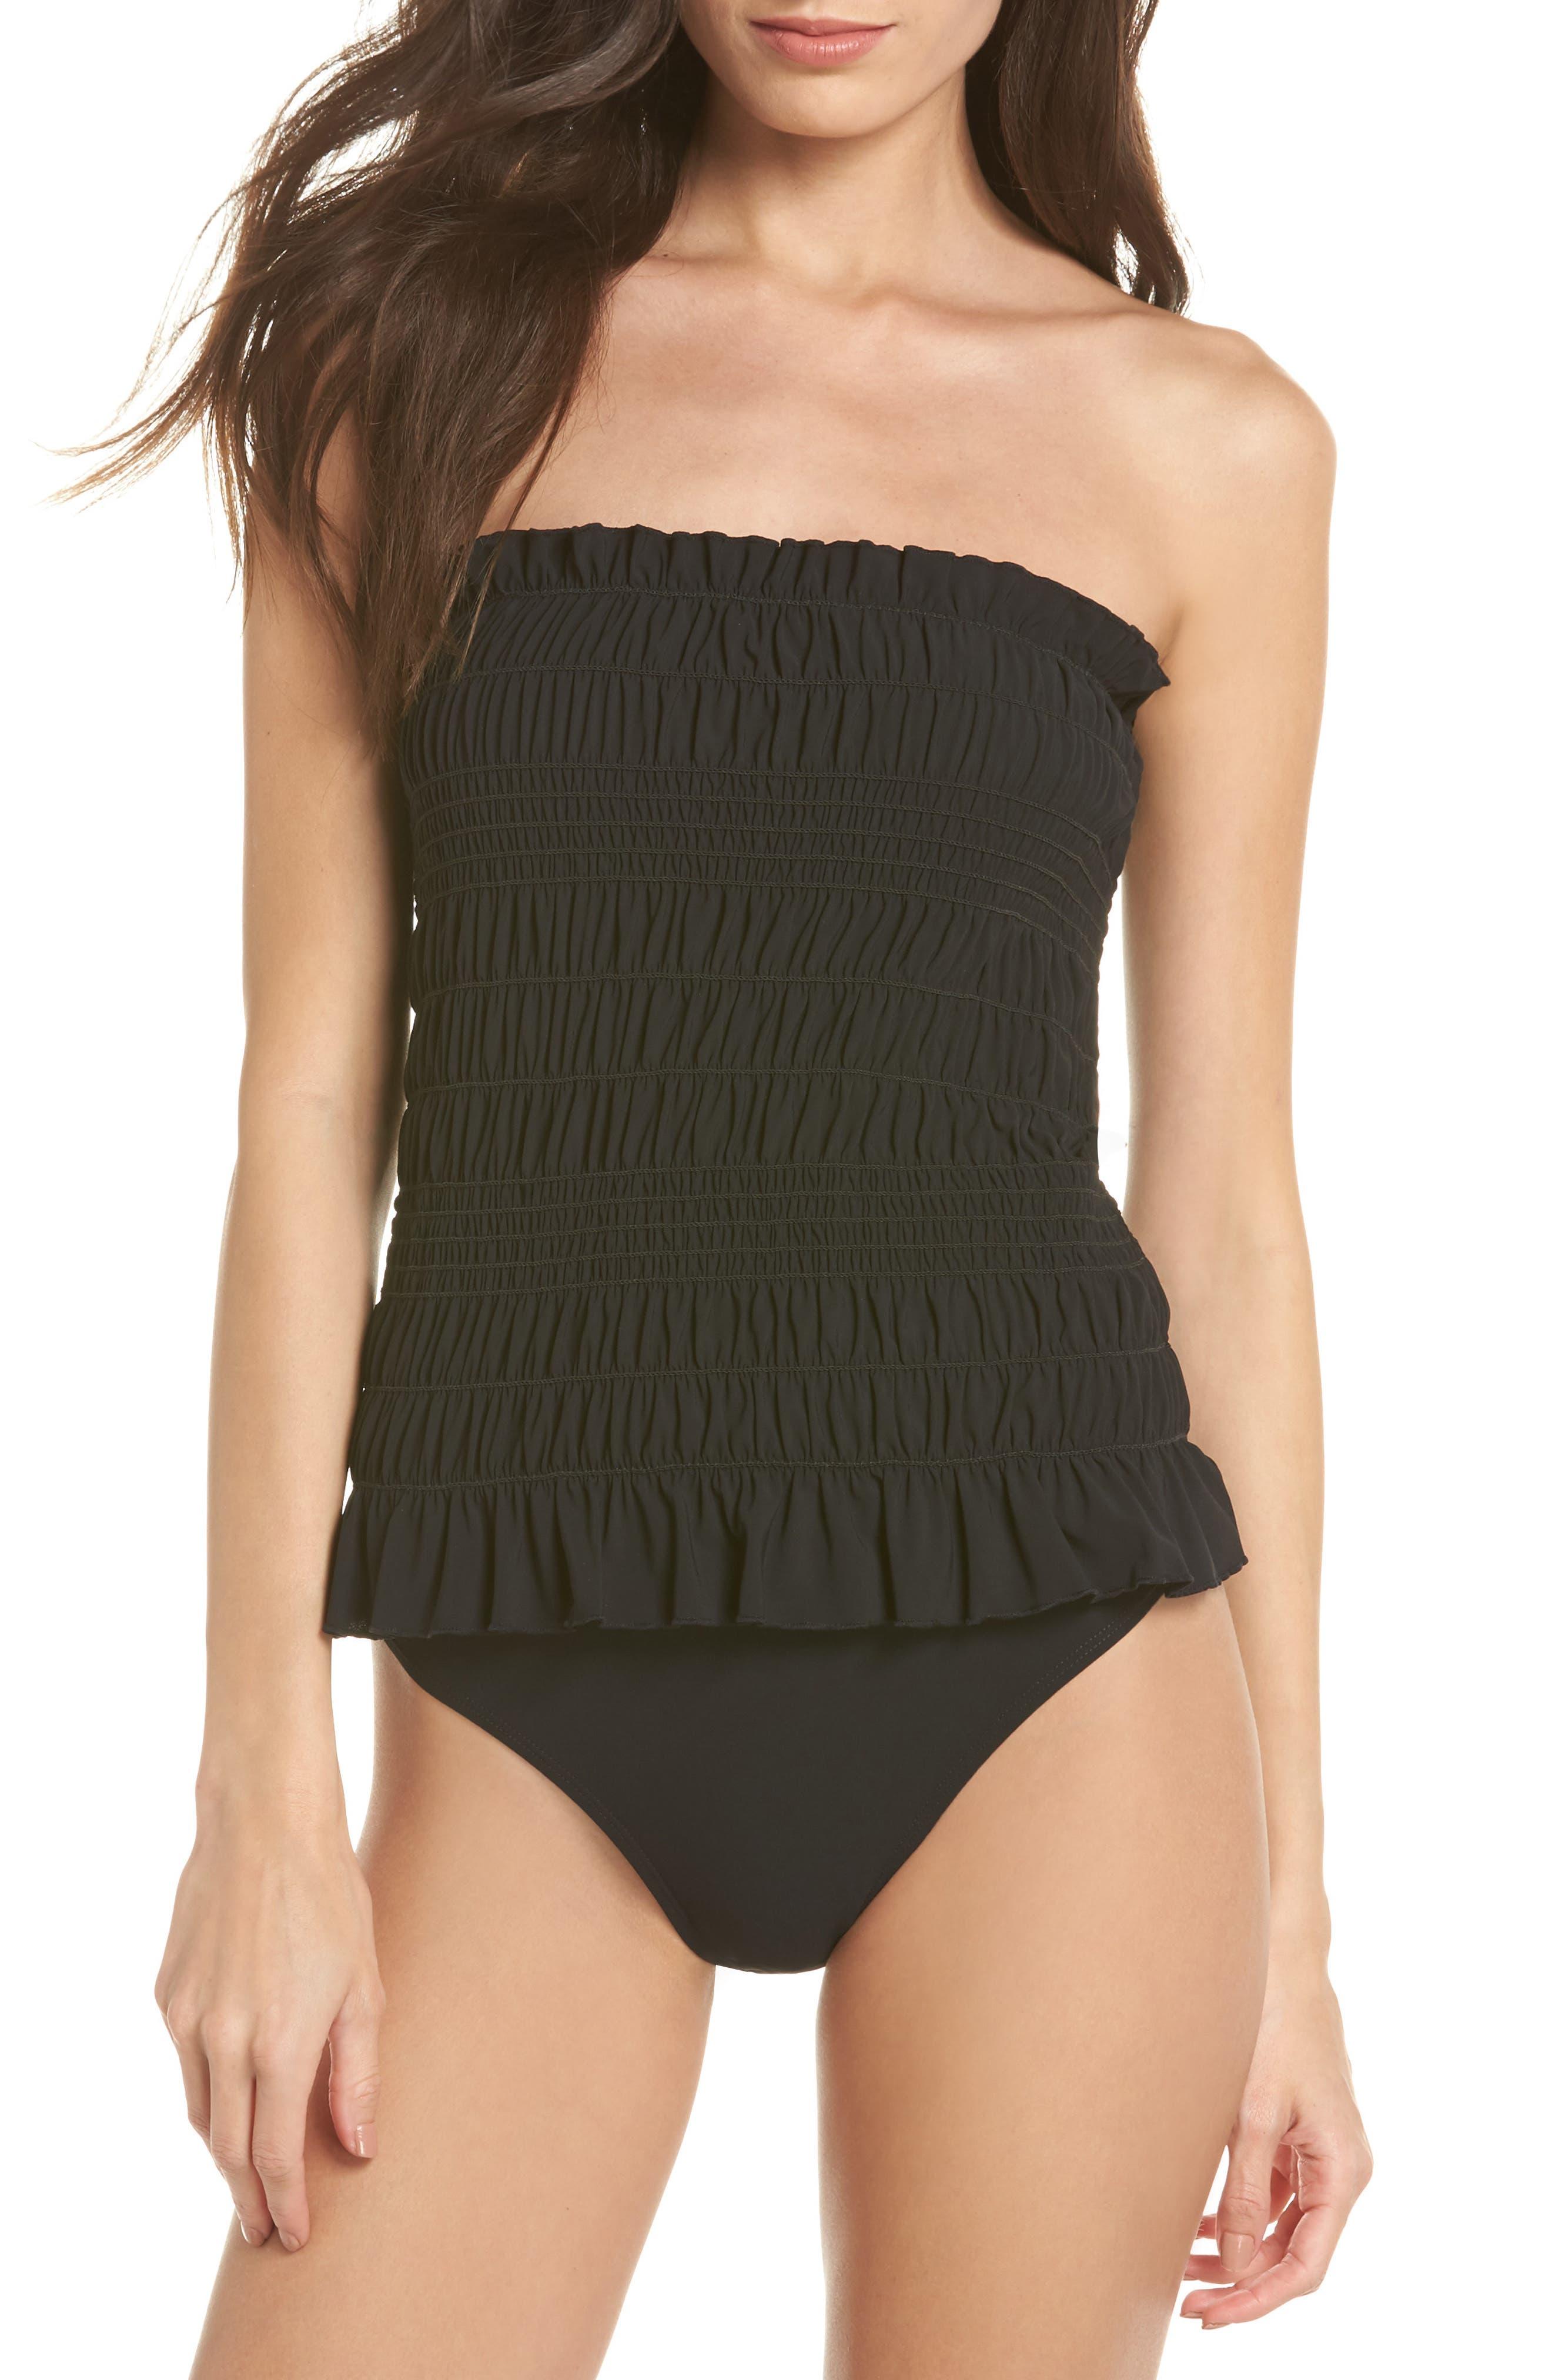 Tory Burch Costa Smocked One-Piece Swimsuit, Black